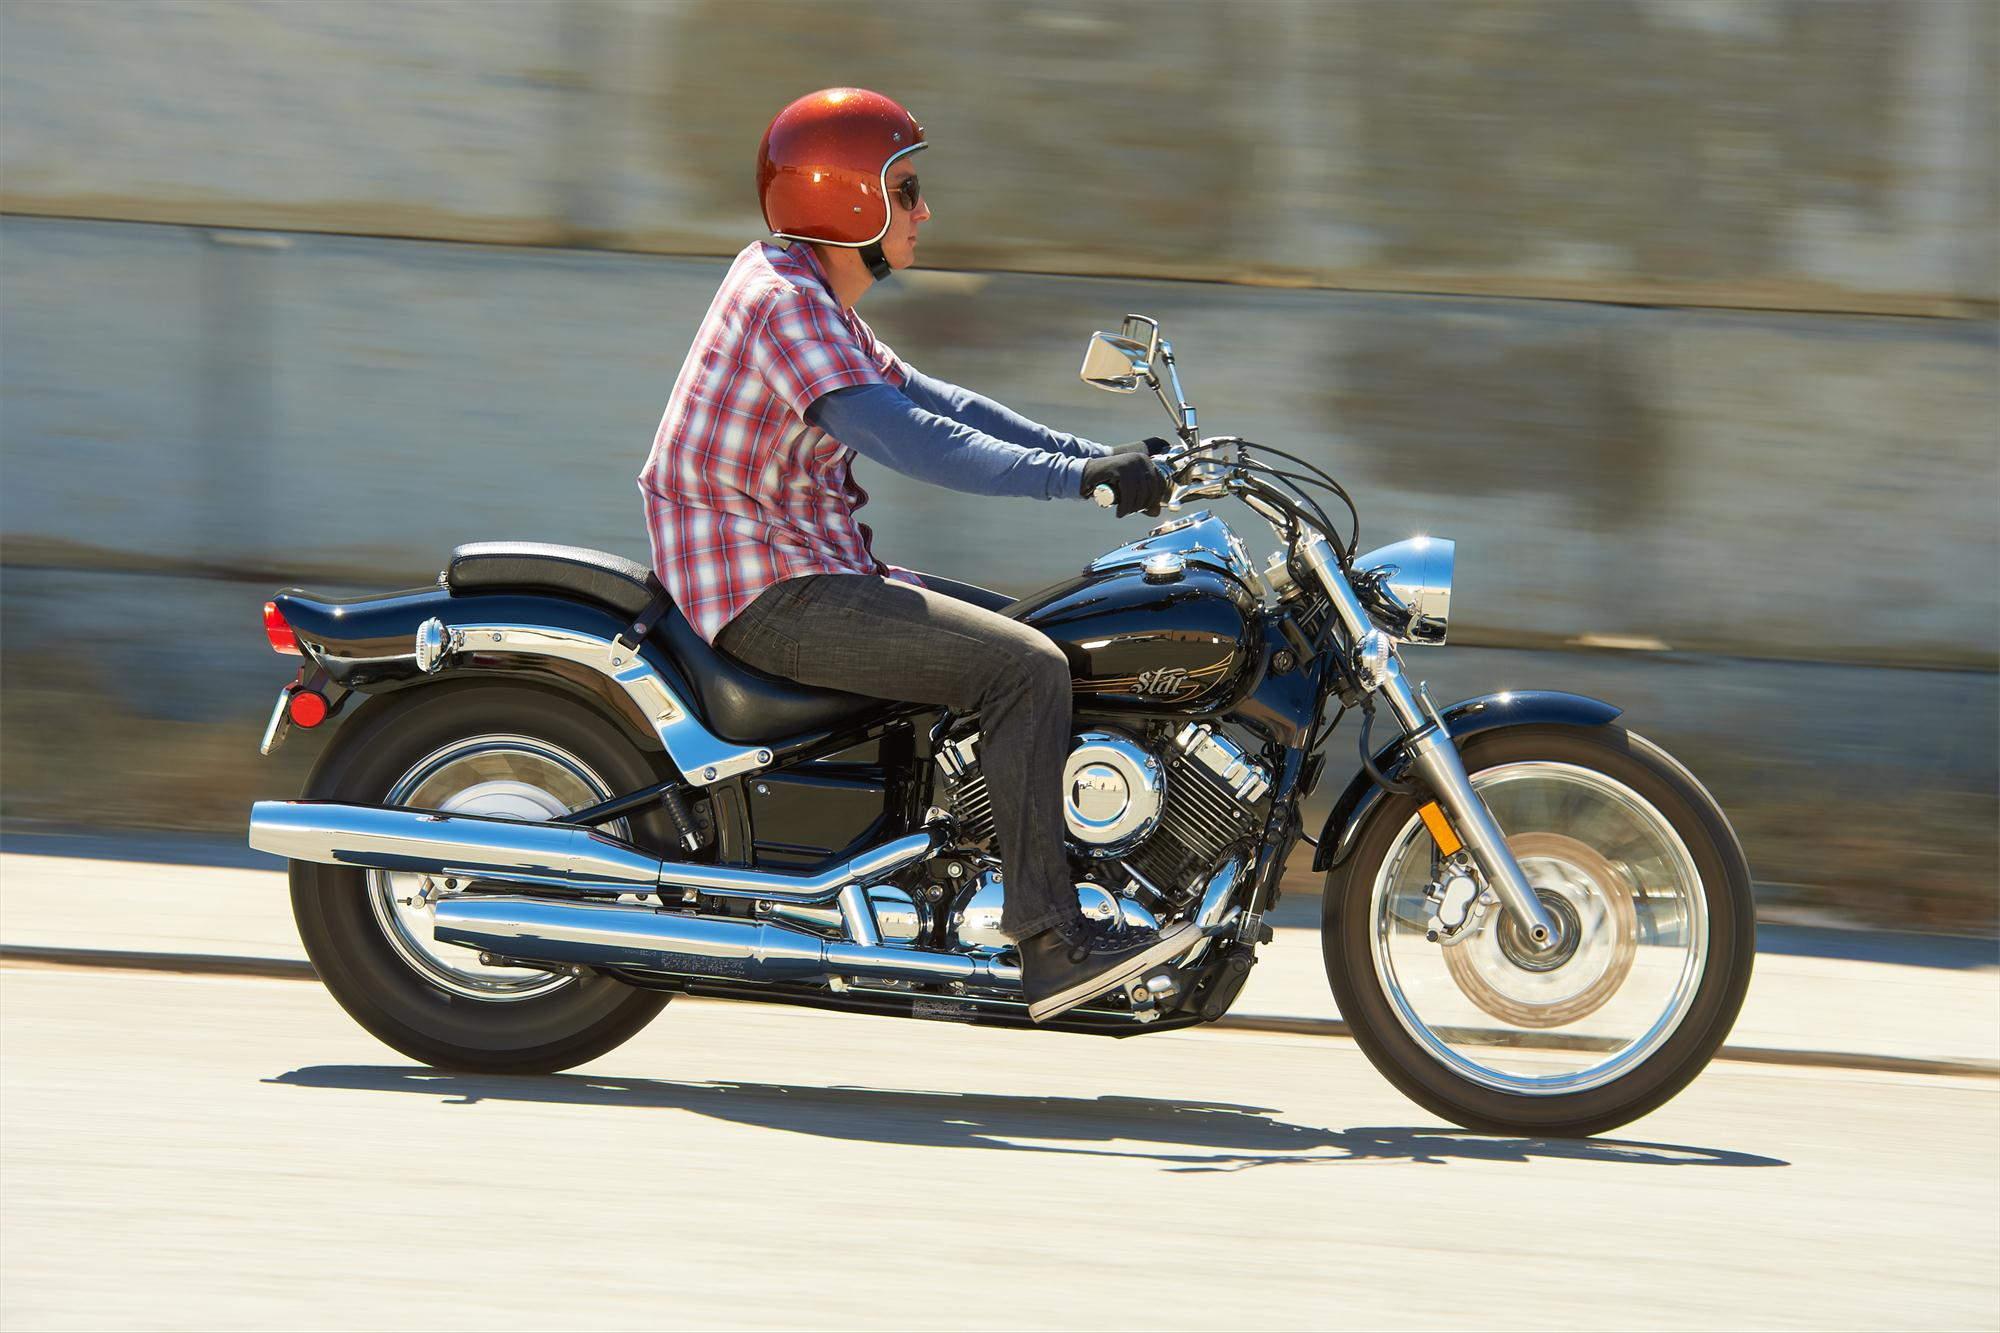 Тест-драйв мотоцикла Yamaha XVS650 Drag Star